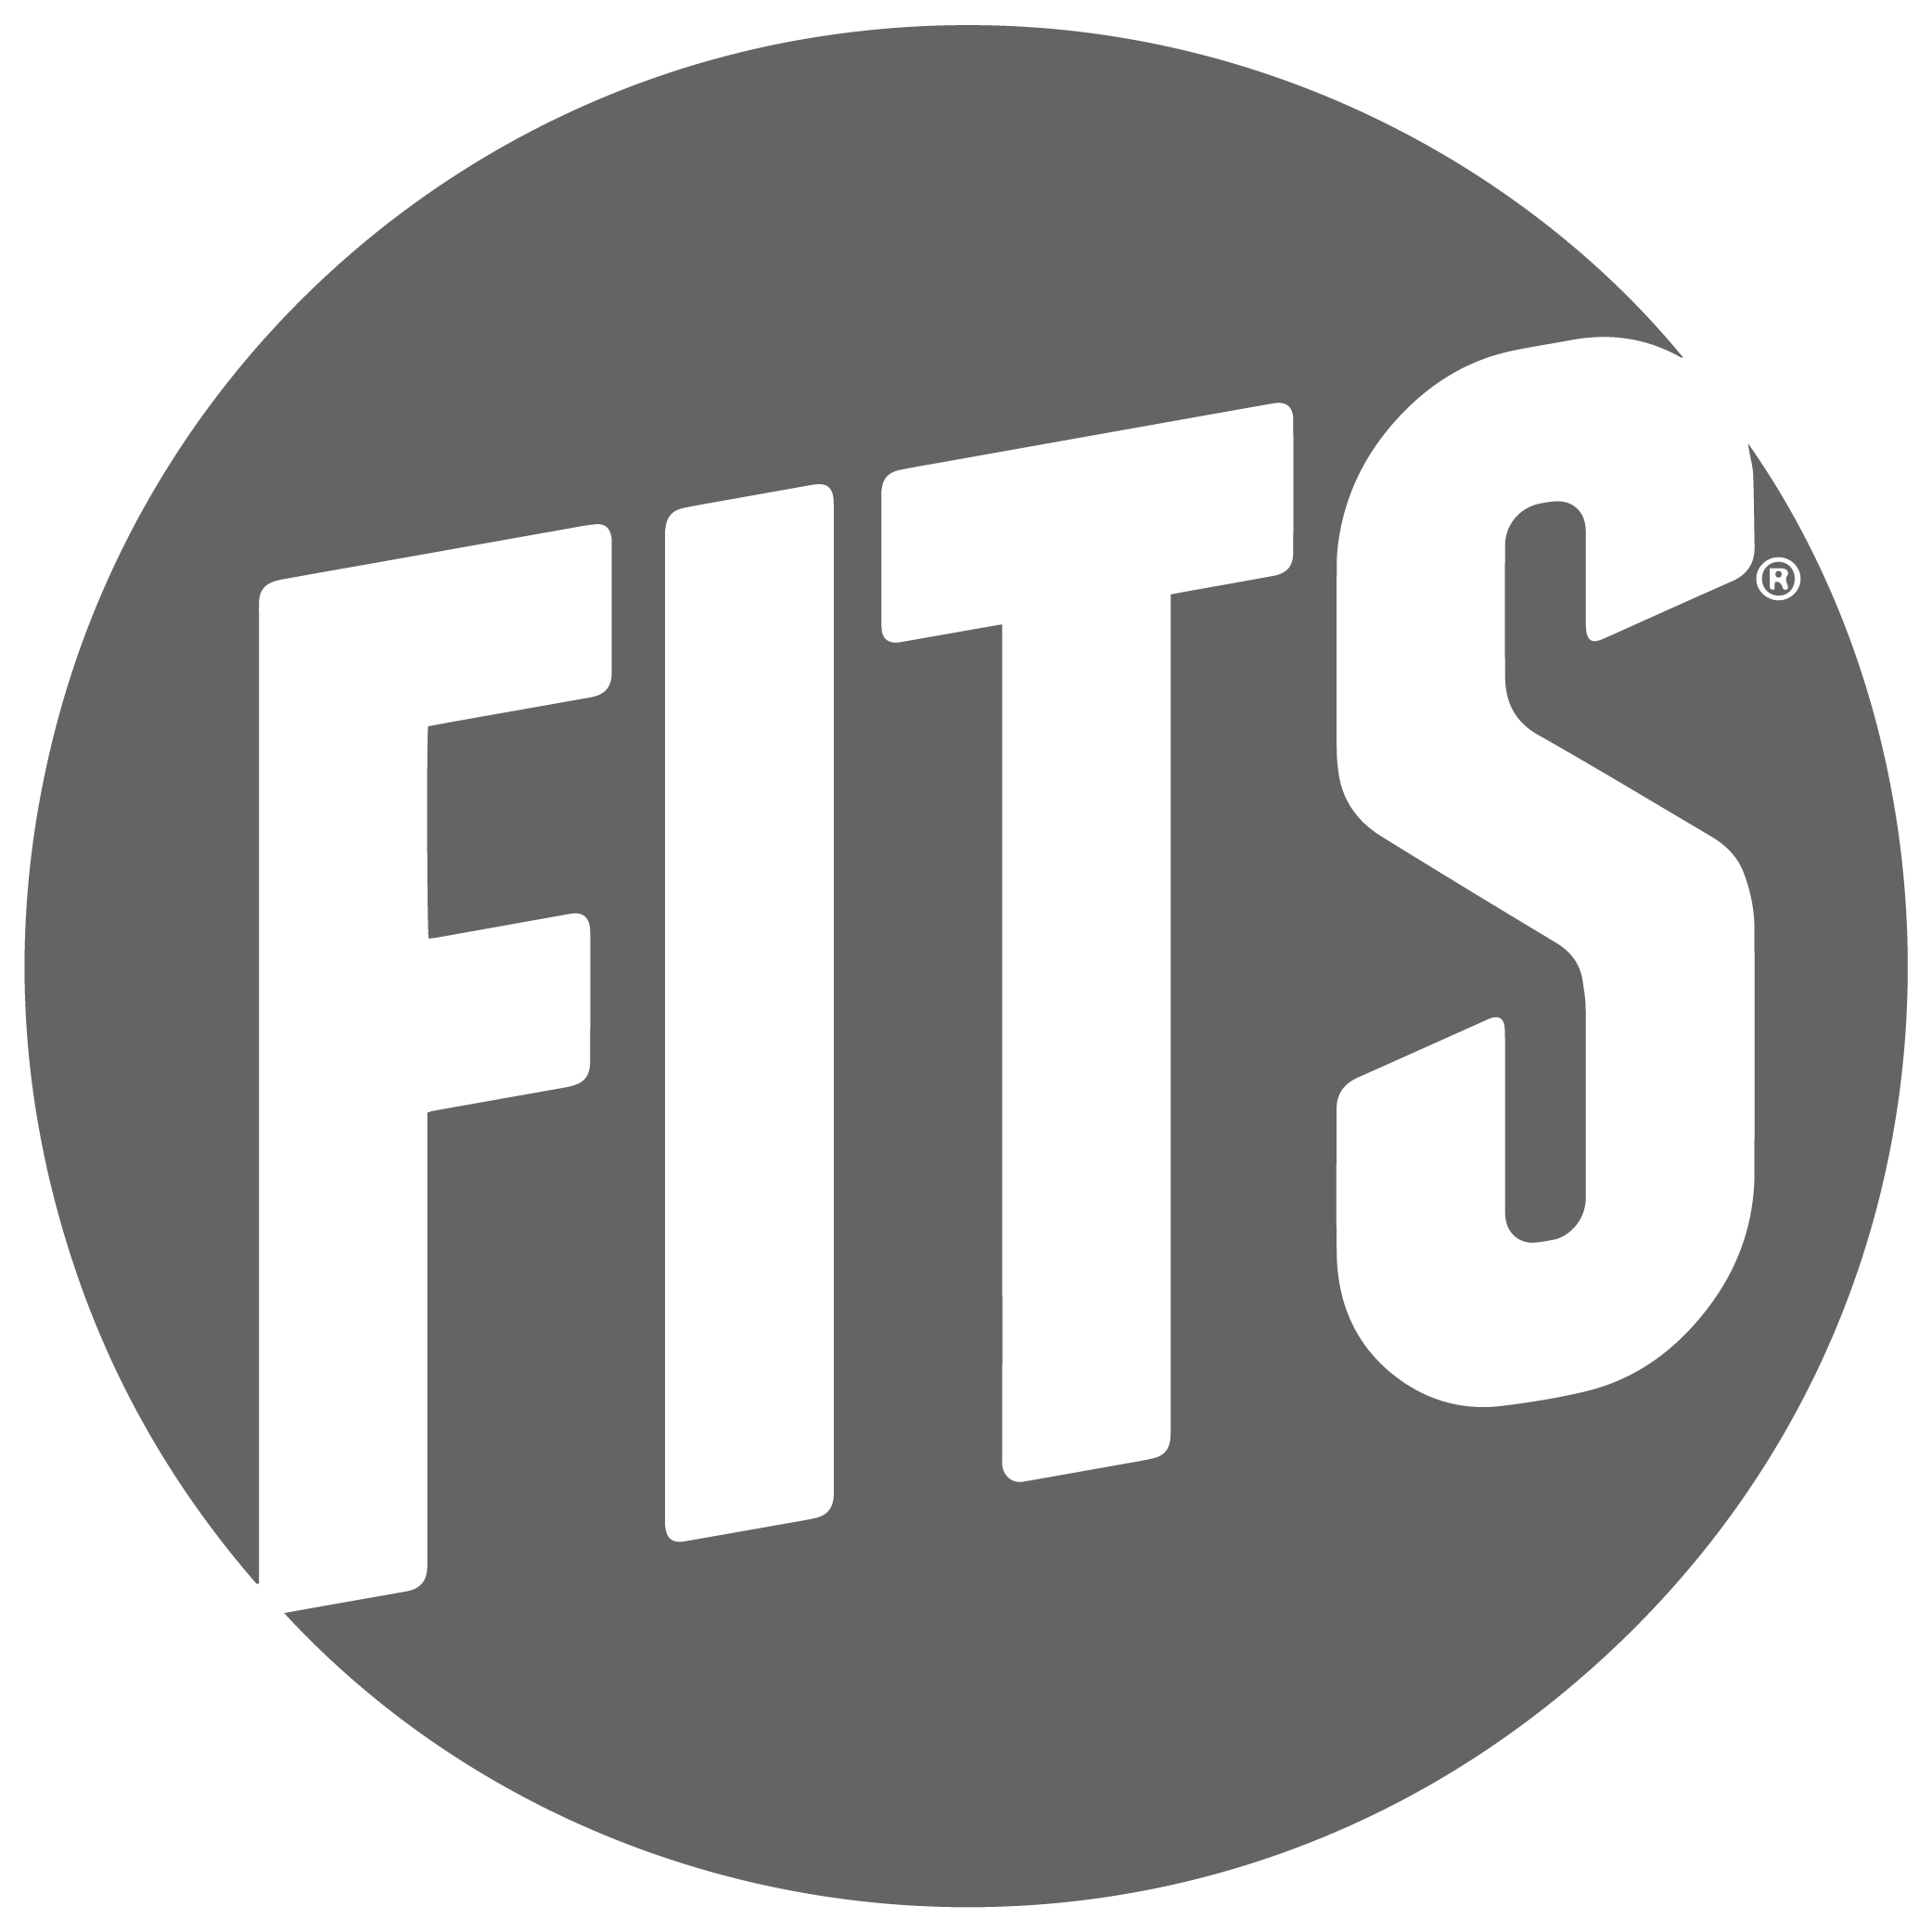 FITS-logo-graphite-01 copy.png